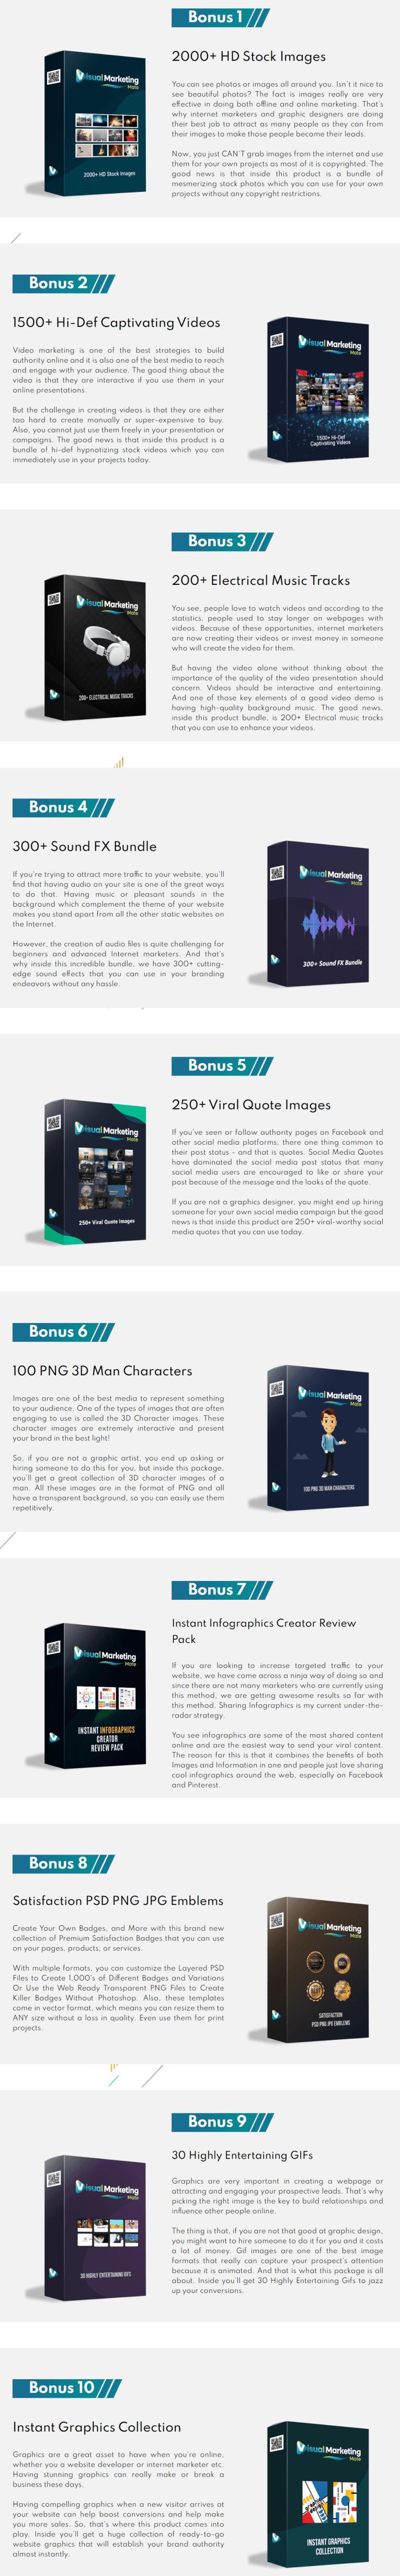 Visual Marketing Mate Bonus